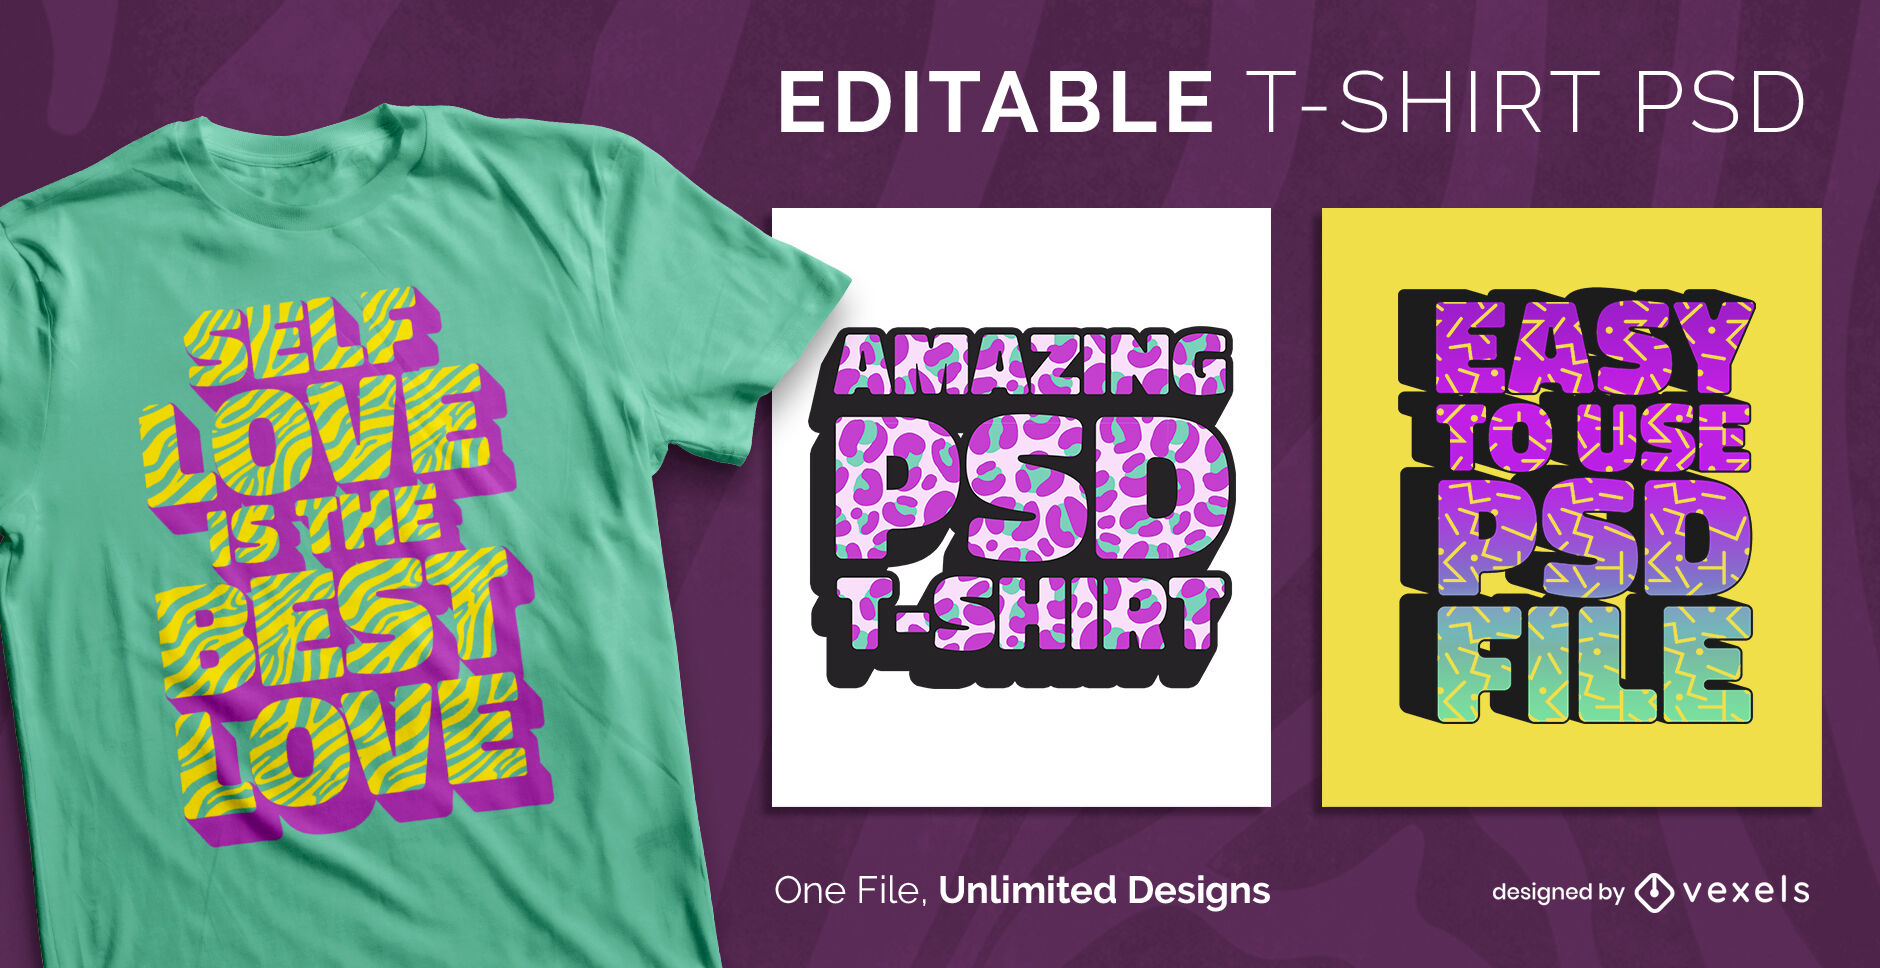 3D pattern textures text scalable t-shirt psd